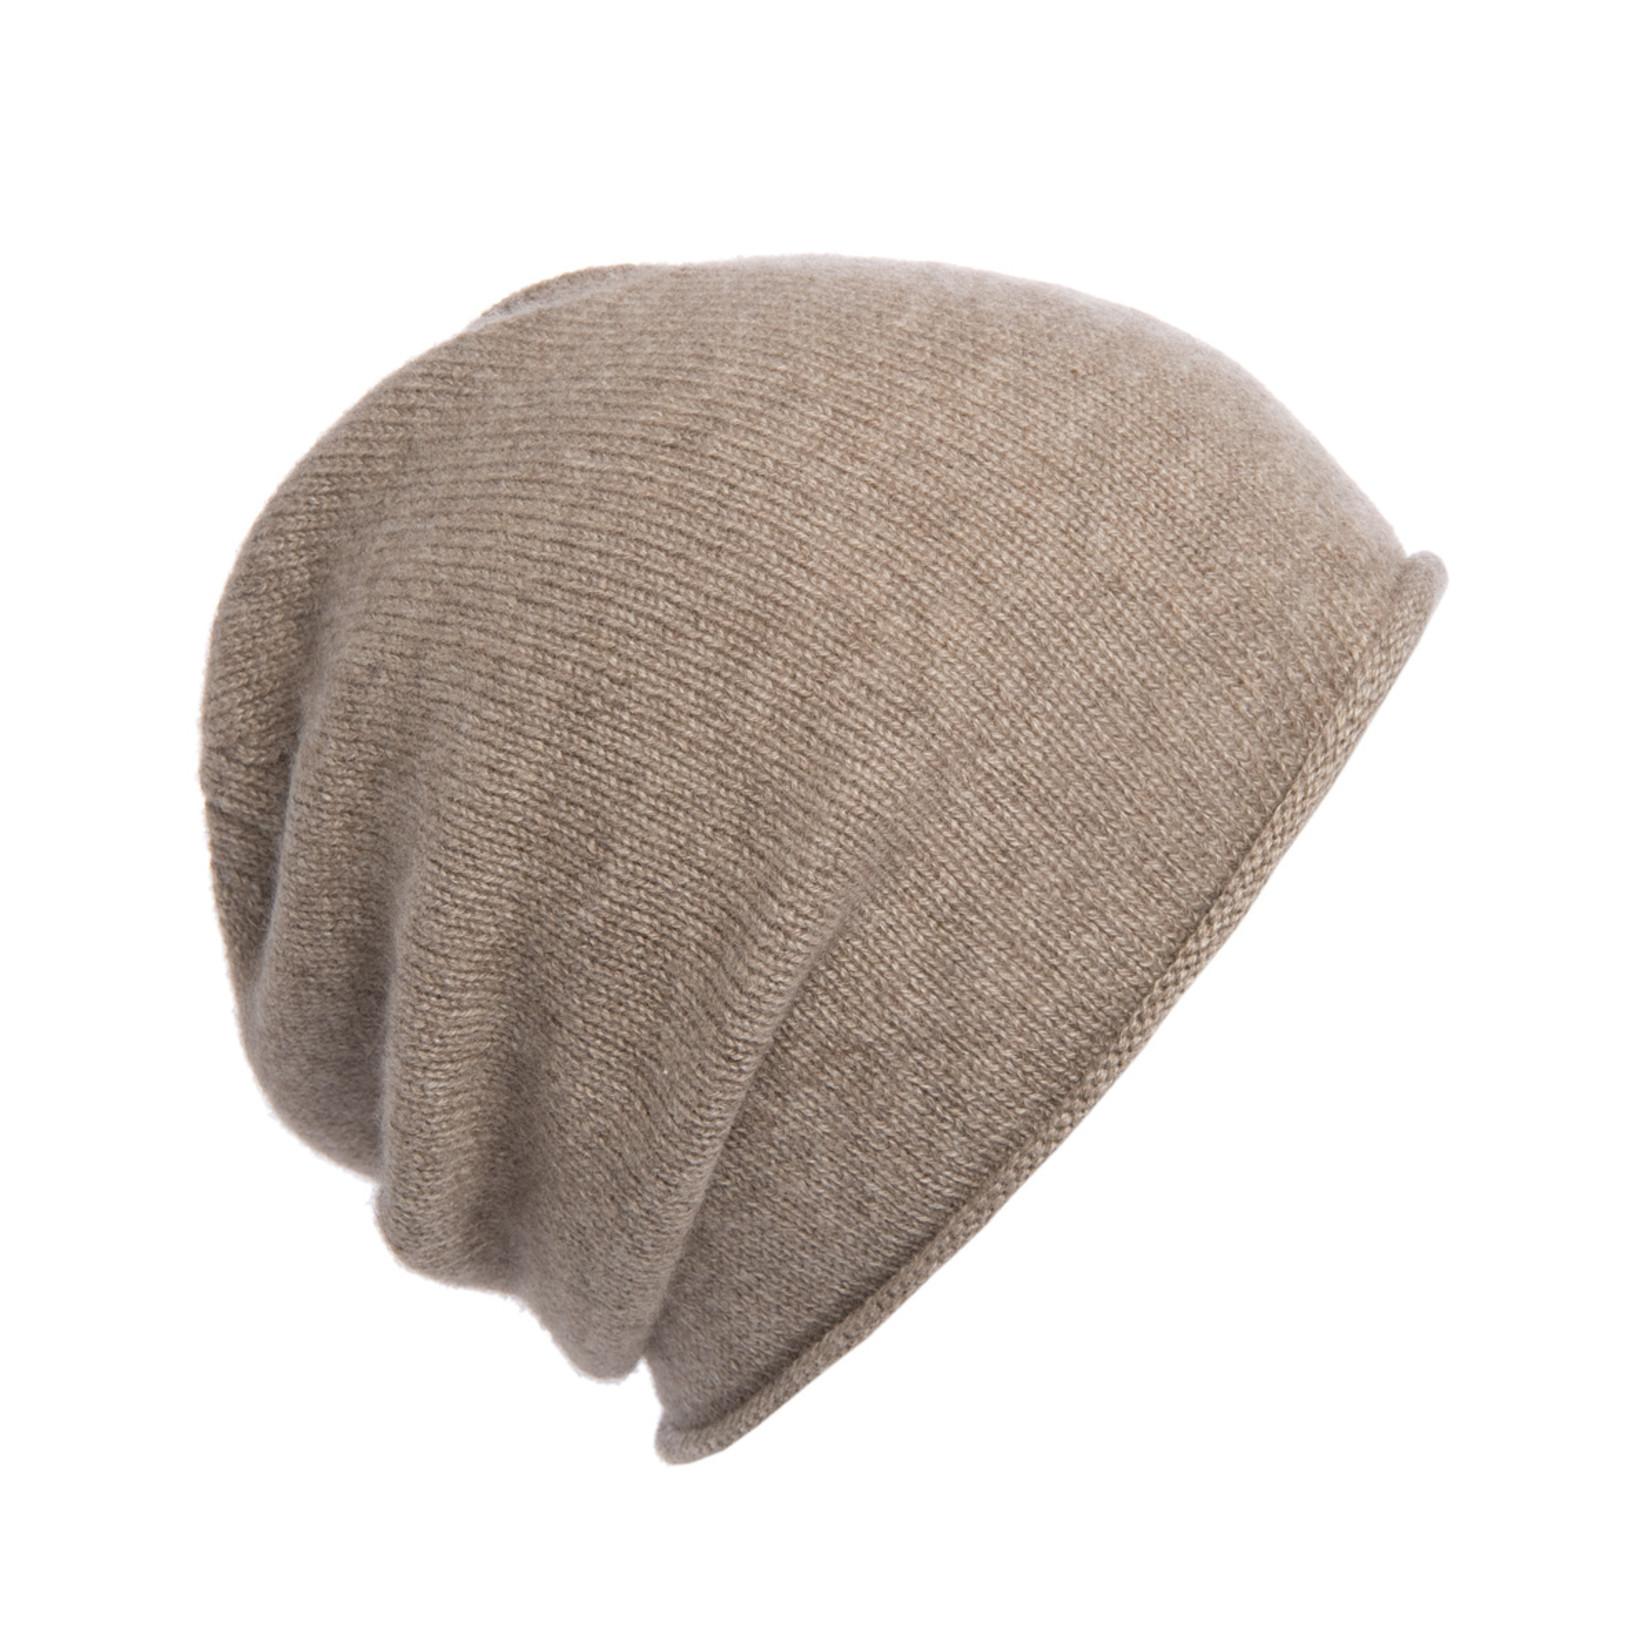 Odno - Mütze aus Yakwolle capuccino